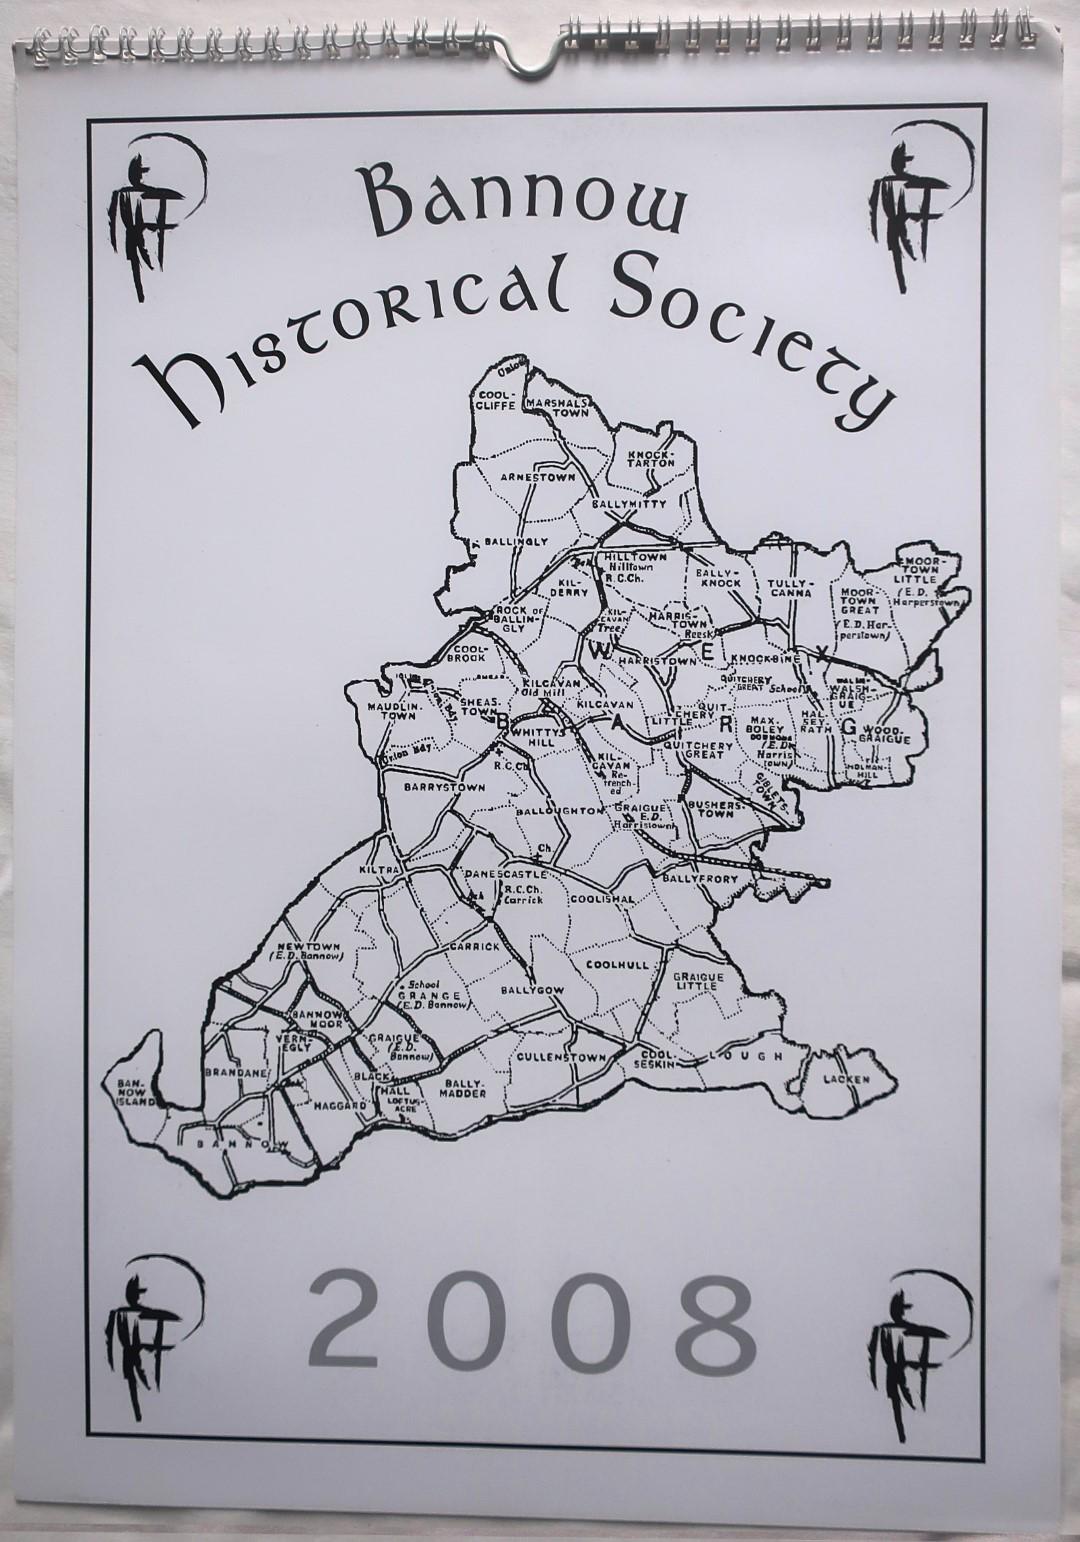 Bannow Historical Society Wexford Calendar 2008